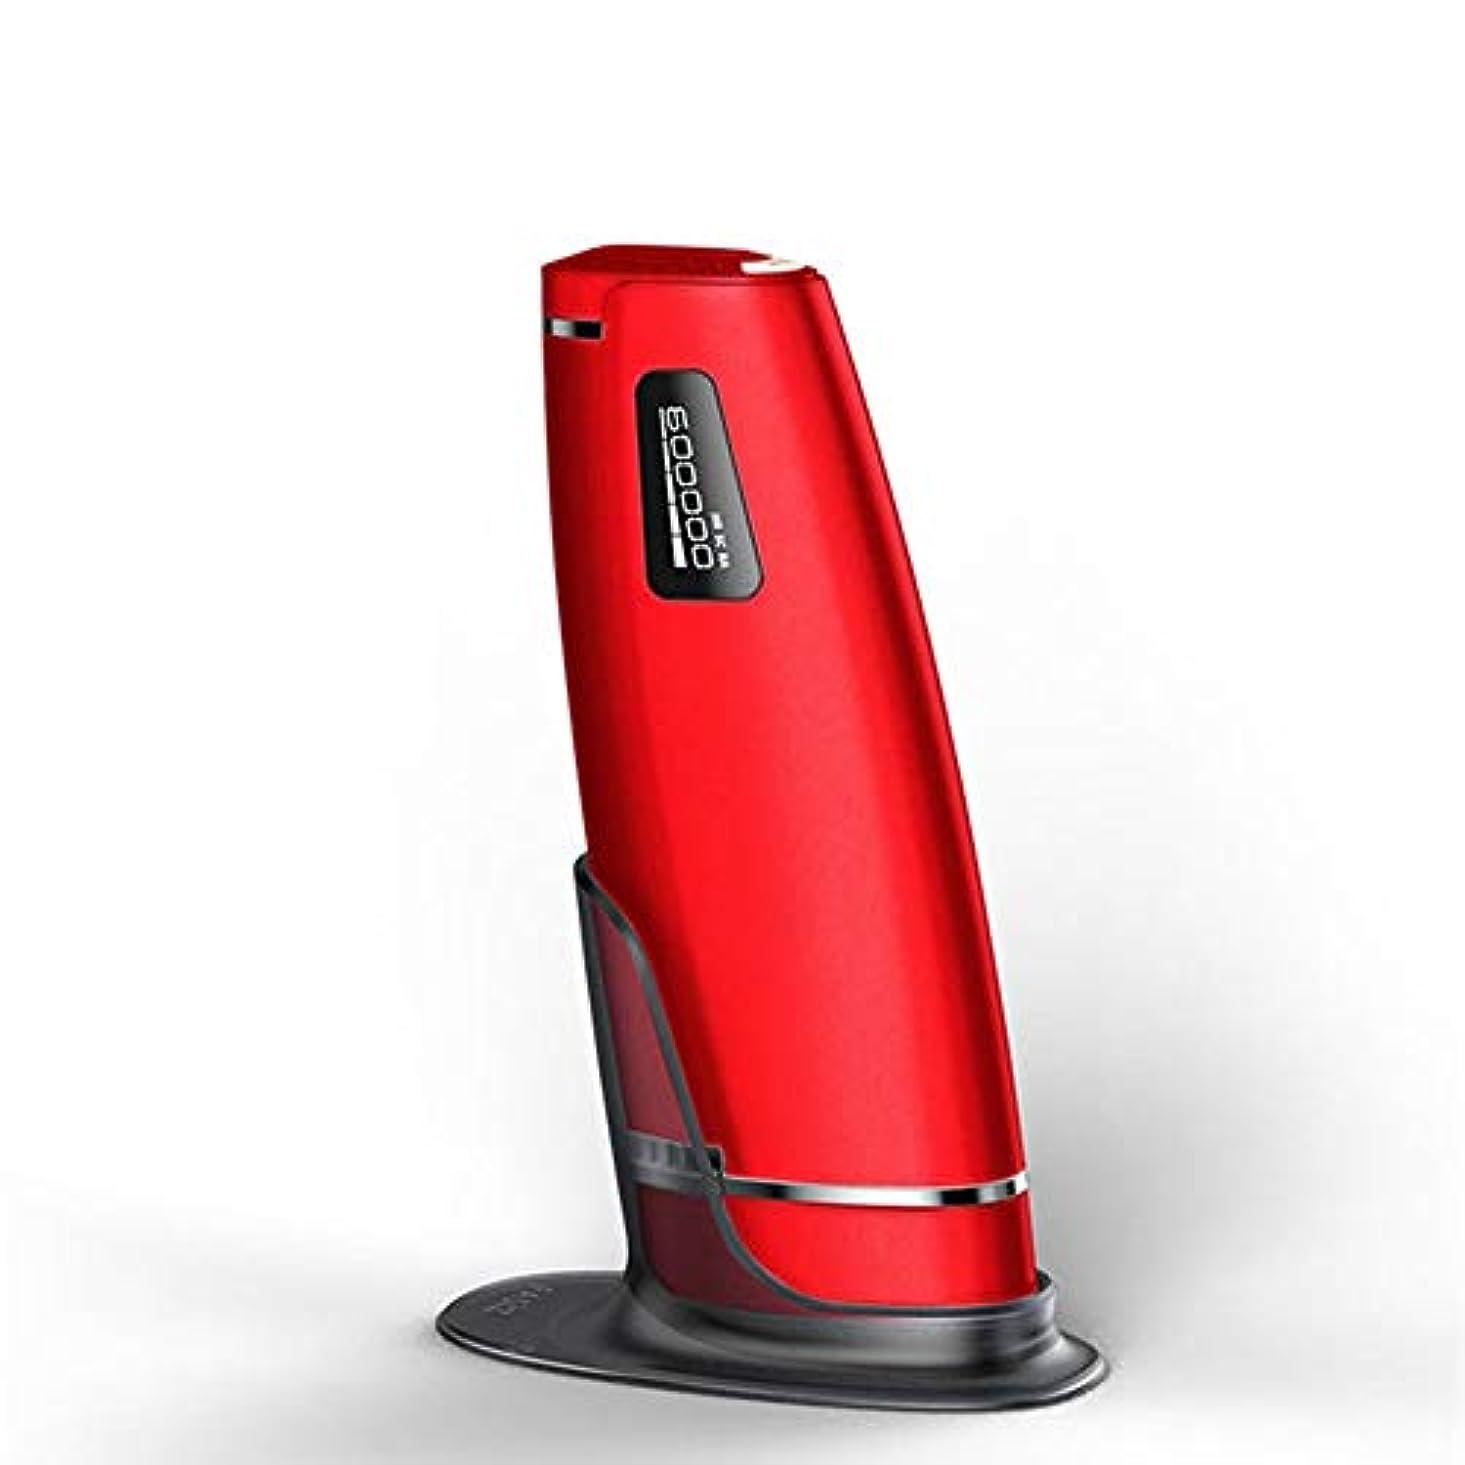 Nuanxin 赤、デュアルモード、ホームオートマチック無痛脱毛剤、携帯用永久脱毛剤、5スピード調整、サイズ20.5 X 4.5 X 7 Cm F30 (Color : Red)